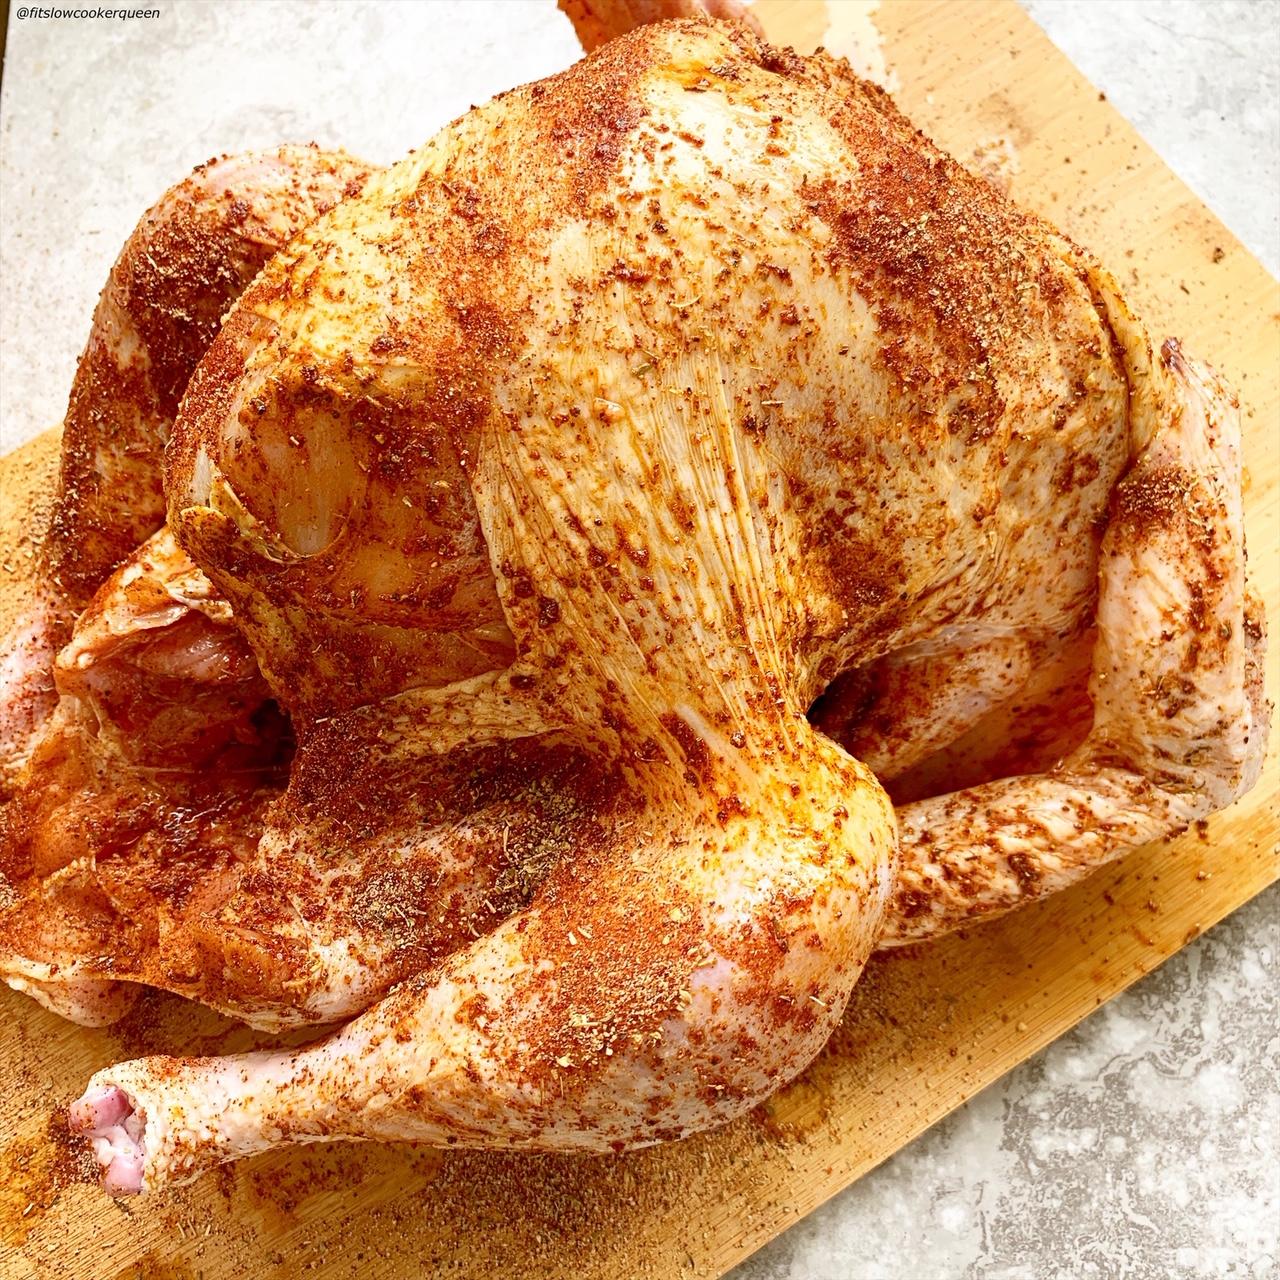 raw whole turkey seasoned with homemade rotisserie seasoning